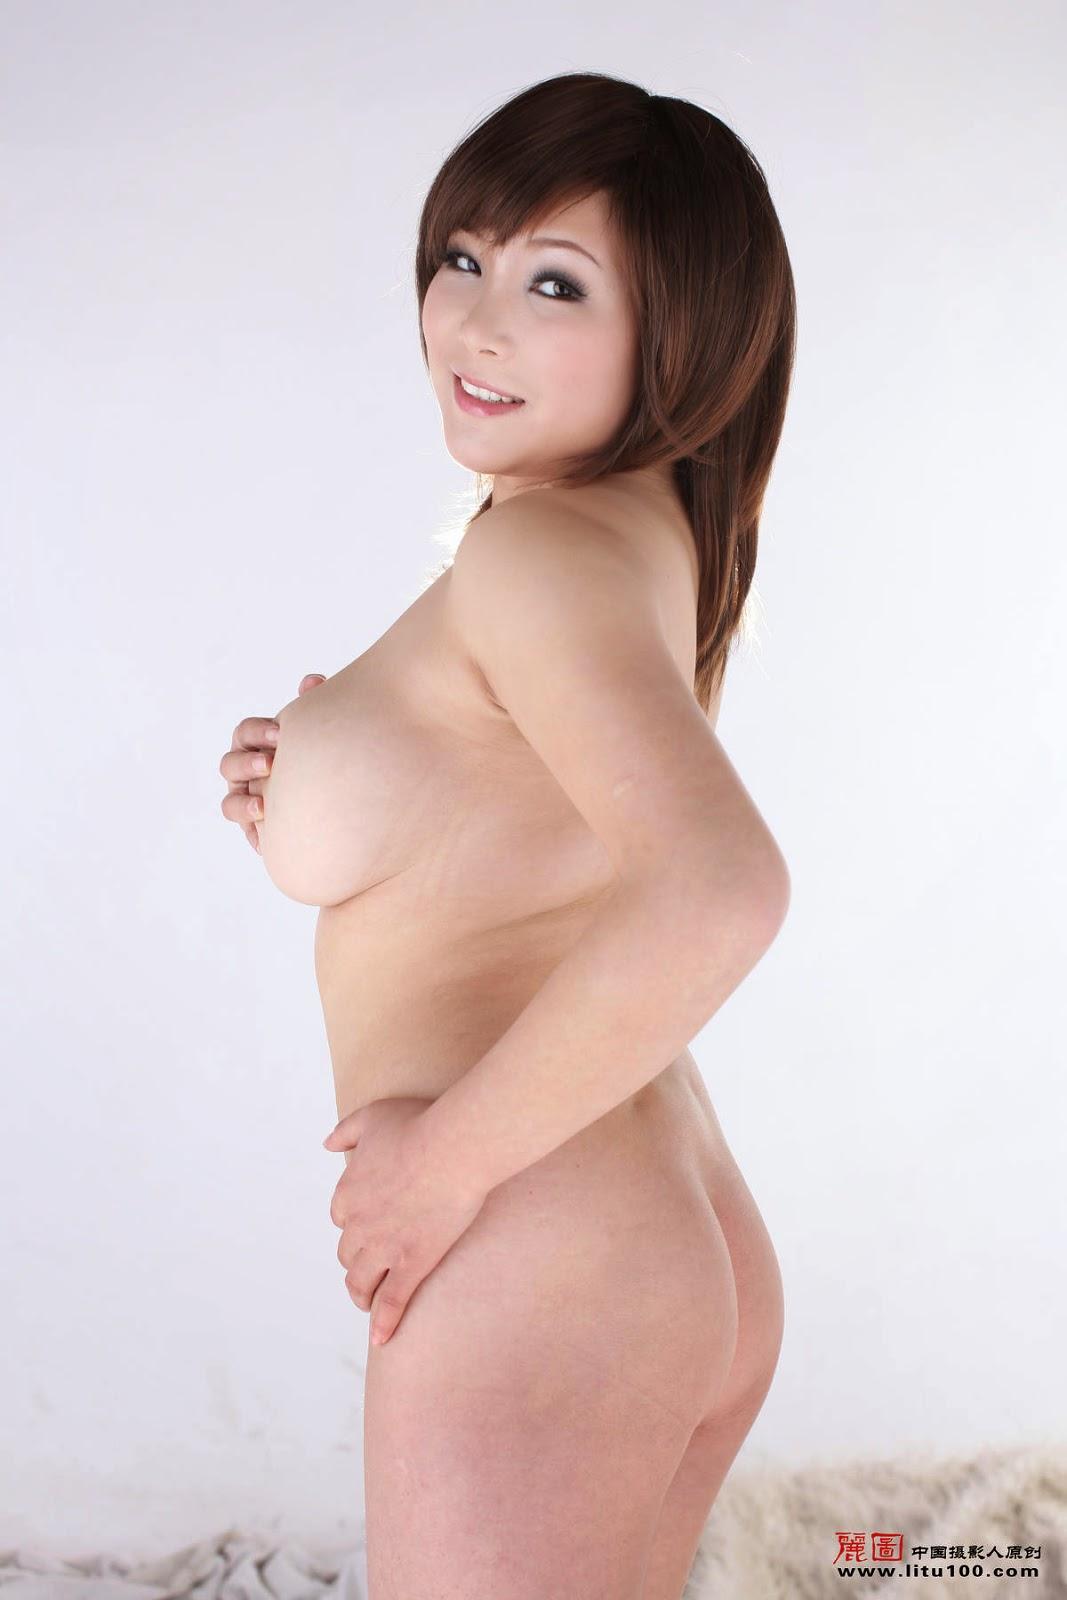 Chinese Nude Model Ju Dan [Litu100]   18+ gallery photos ...